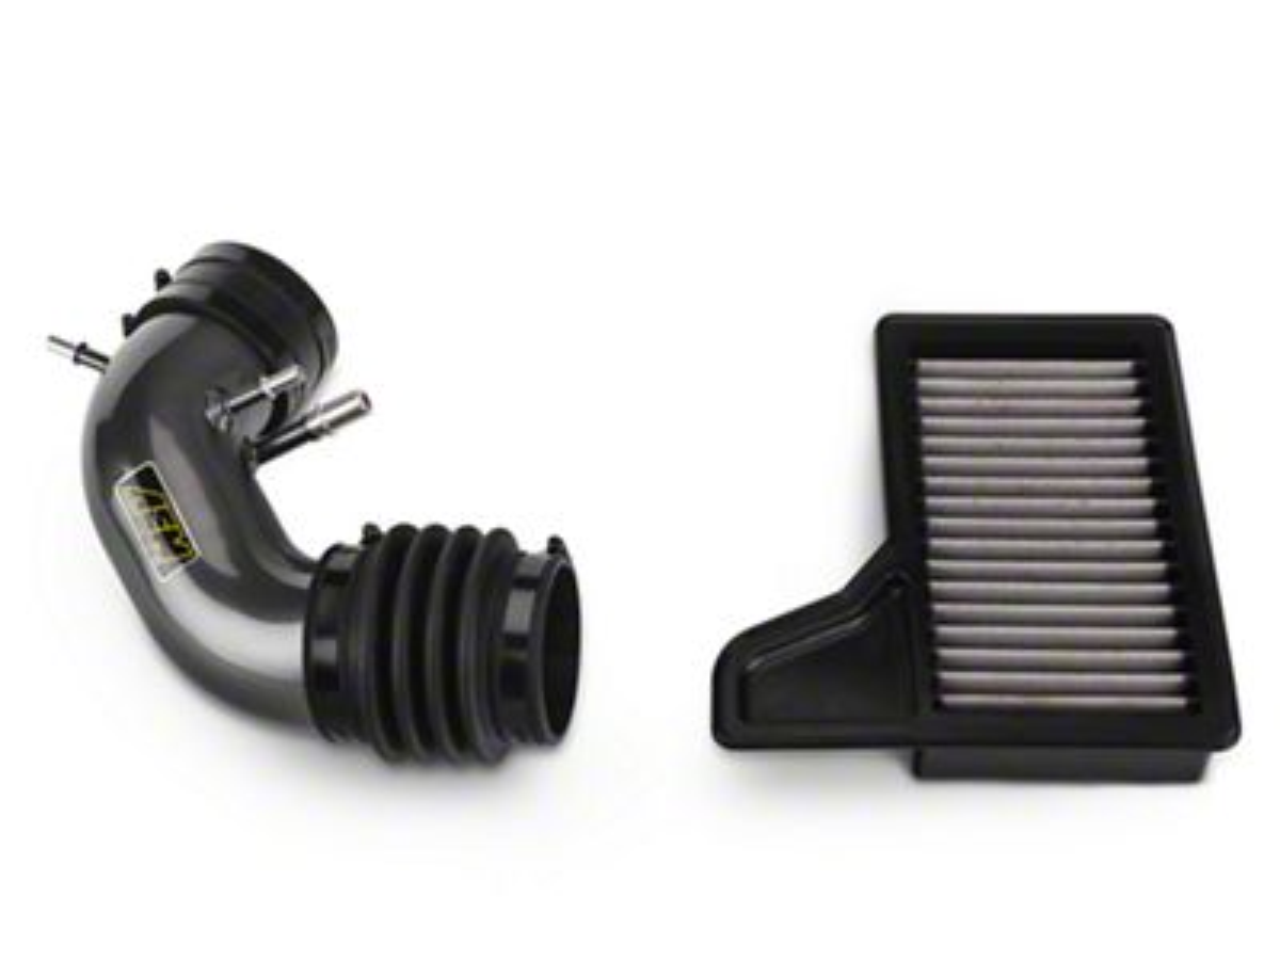 AEM Intake Tube w/ DryFlow Replacement Air Filter (15-17 GT)